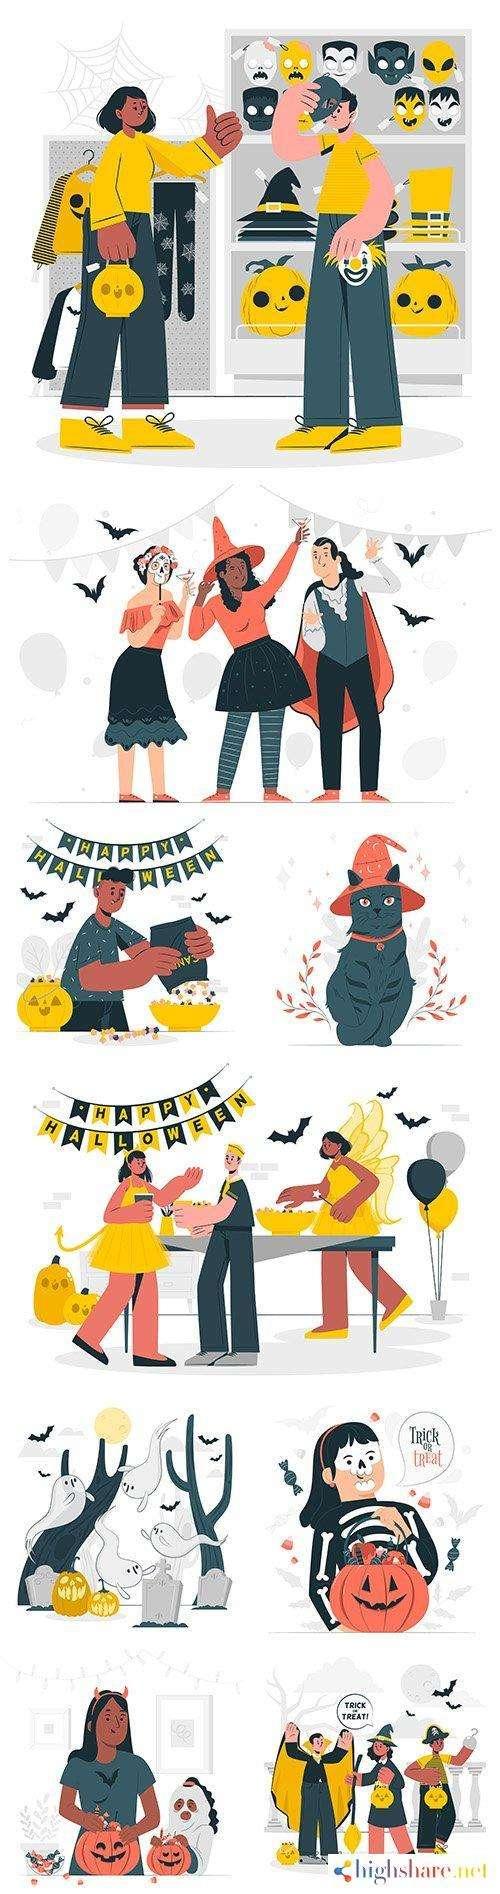 halloween party flat design illustrations 5f452e27d99f2 - Halloween party flat design illustrations